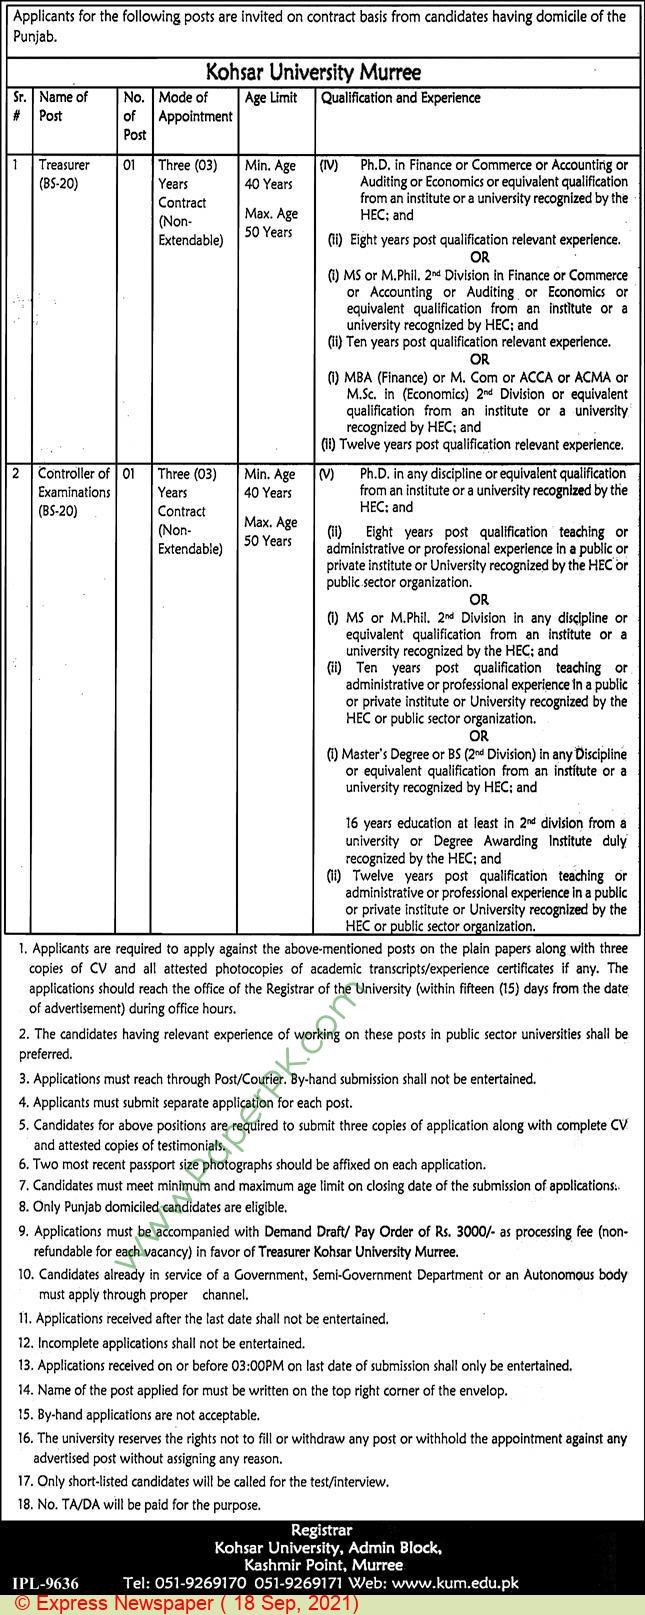 Kohsar University jobs newspaper ad for Treasurer in Murree on 2021-09-18